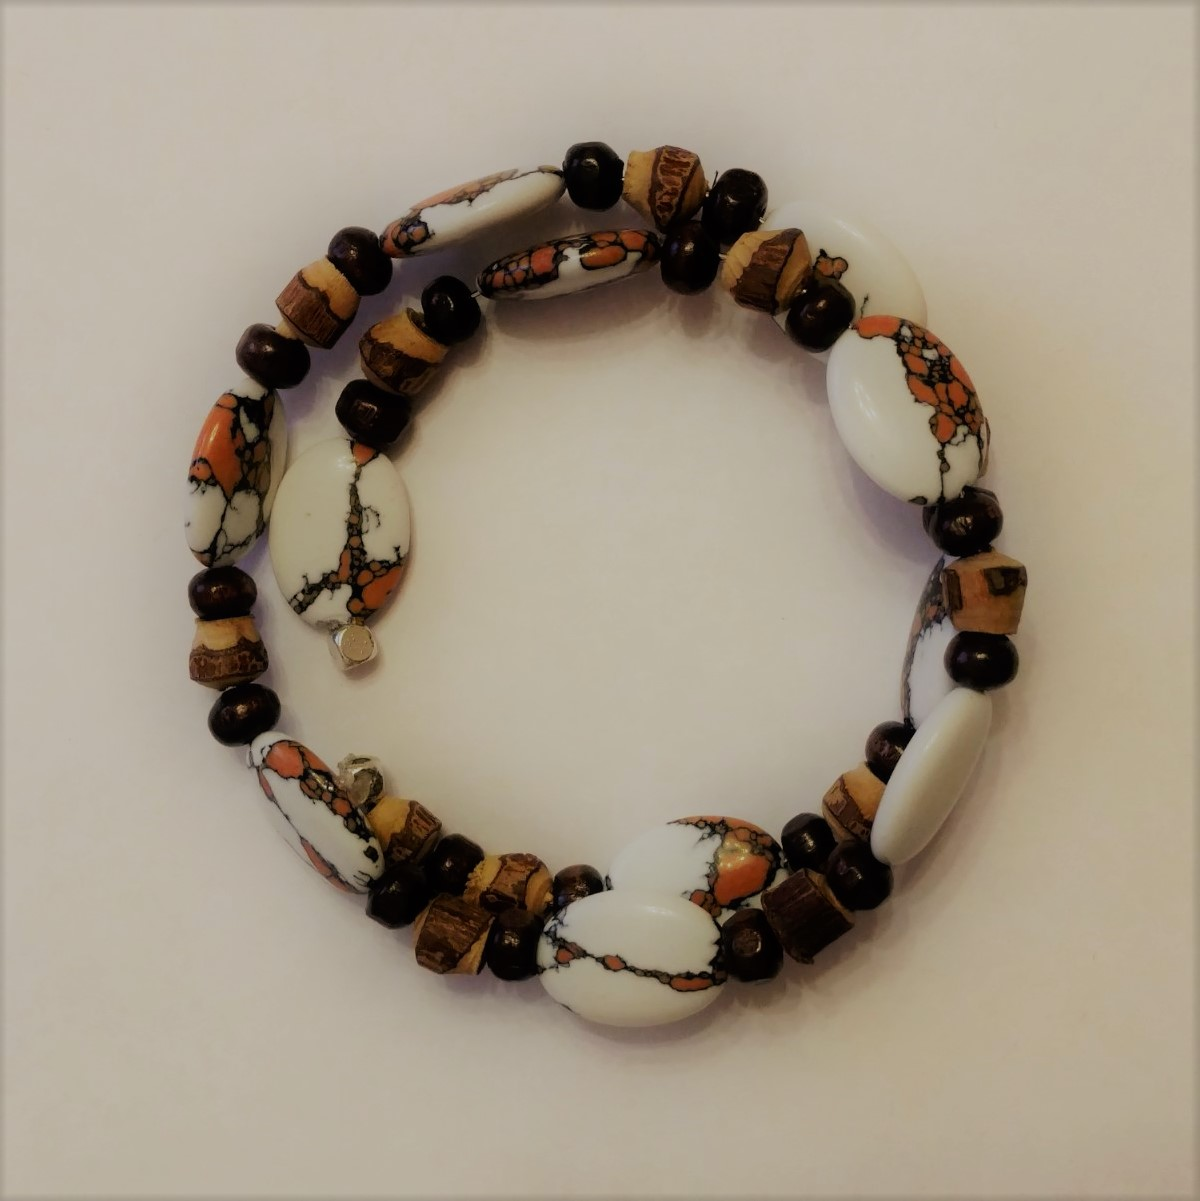 #L&L 181207 Bracelet  Suggested $10 USD